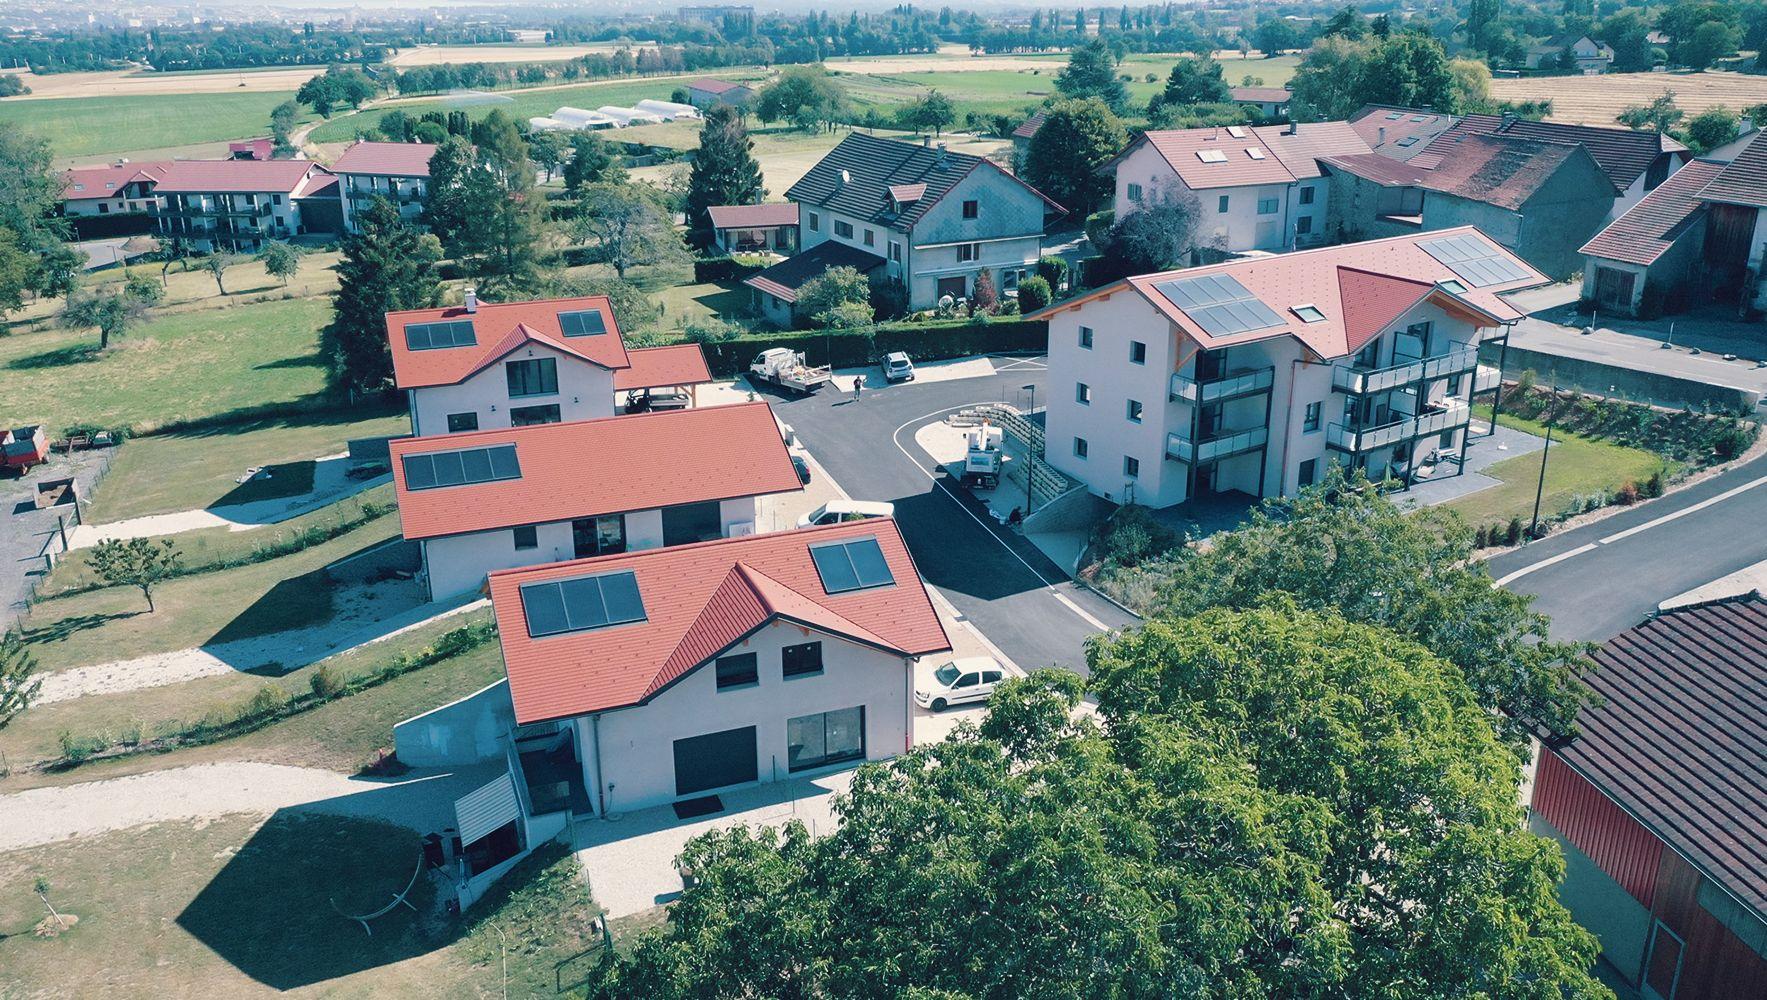 Chauffage solaire SolisArt - Neydens - Haute-Savoie